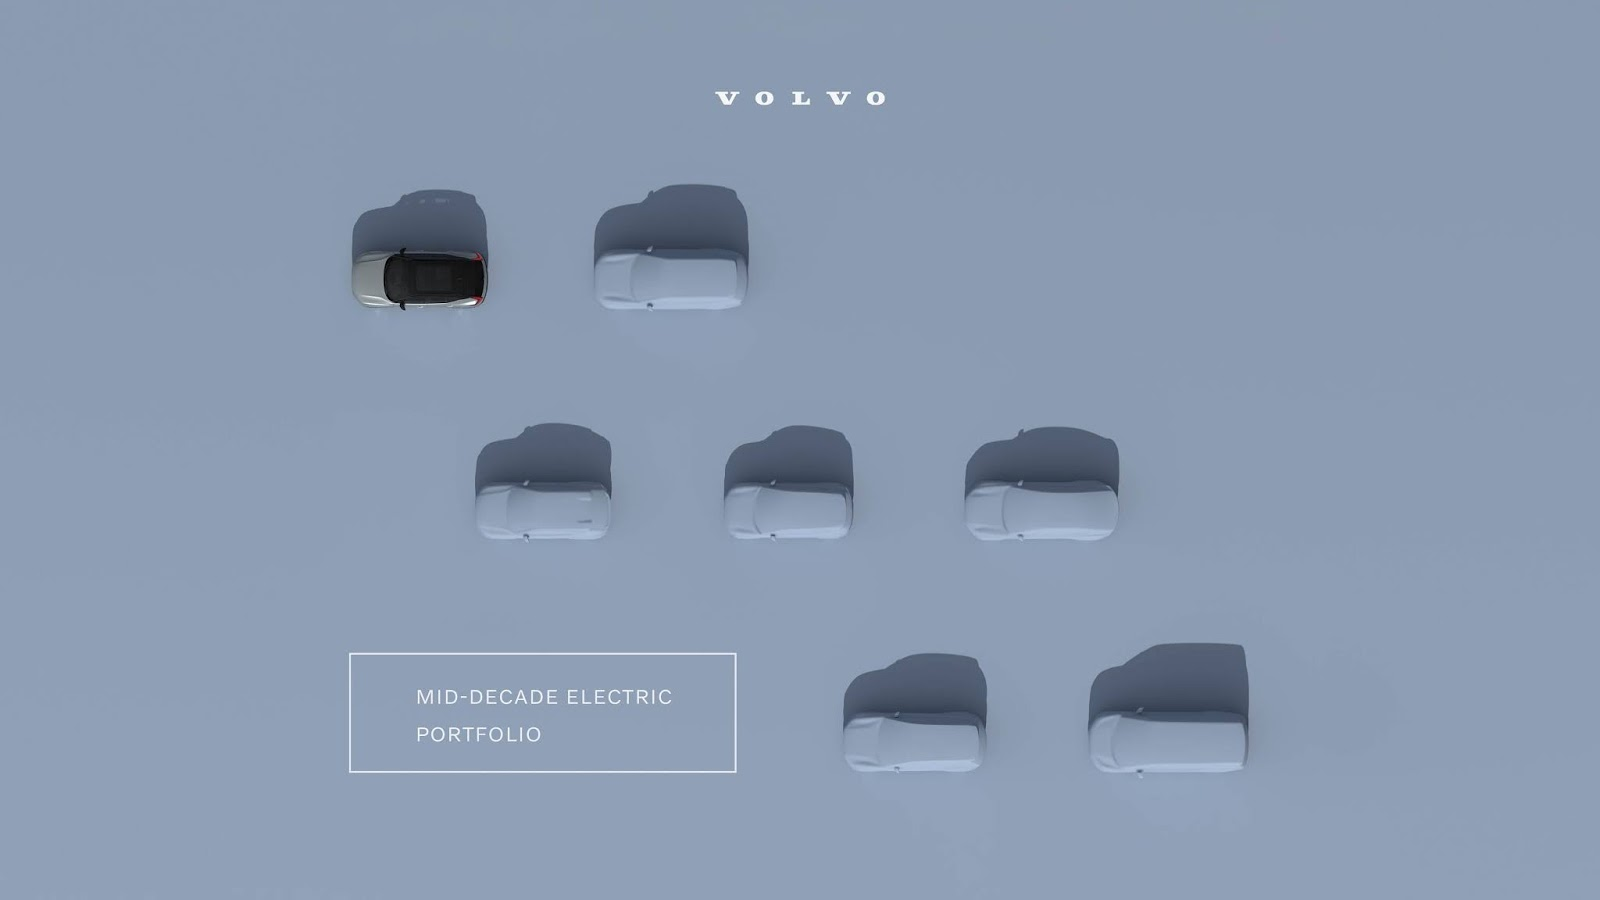 277438 Volvo Cars to be fully electric by 2030 Mid decade electric Μέχρι το 2030, η Volvo θα πουλάει μόνο ηλεκτρικά αυτοκίνητα Electric cars, electric vehicles, EV, Volvo, Volvo Cars, ειδήσεις, ηλεκτρικά, ηλεκτροκινηση